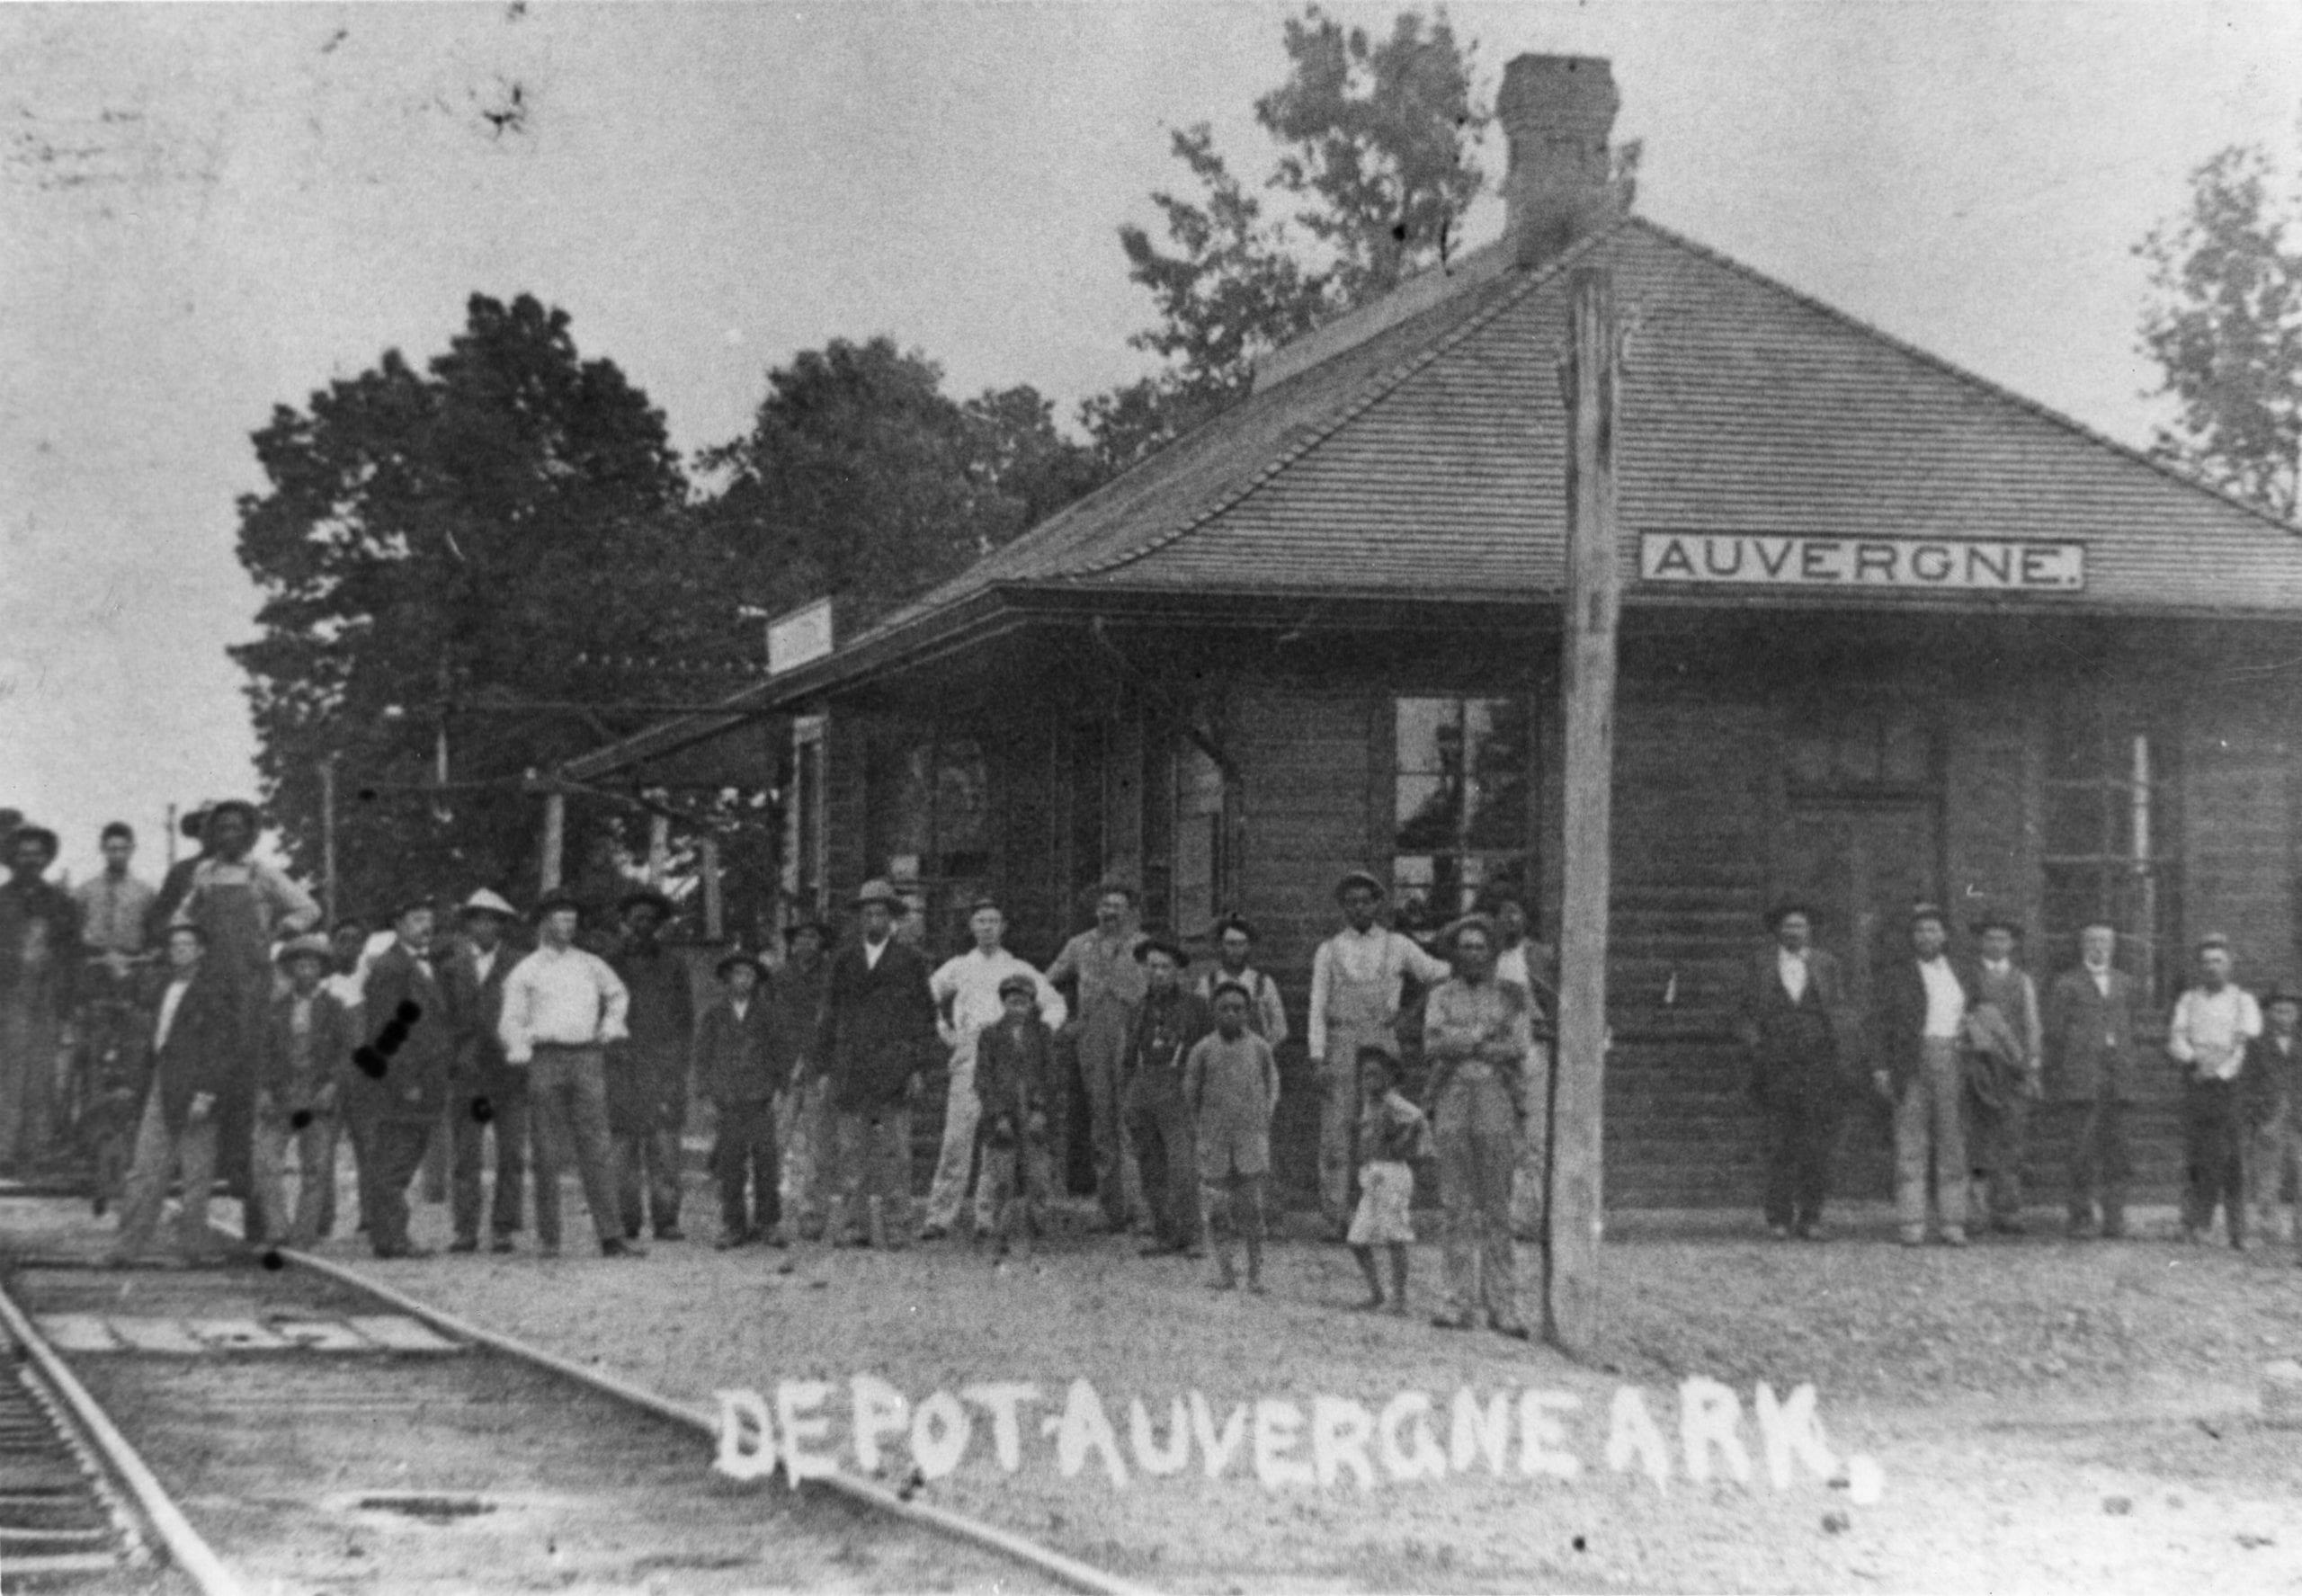 1890's – Auvergne Depot